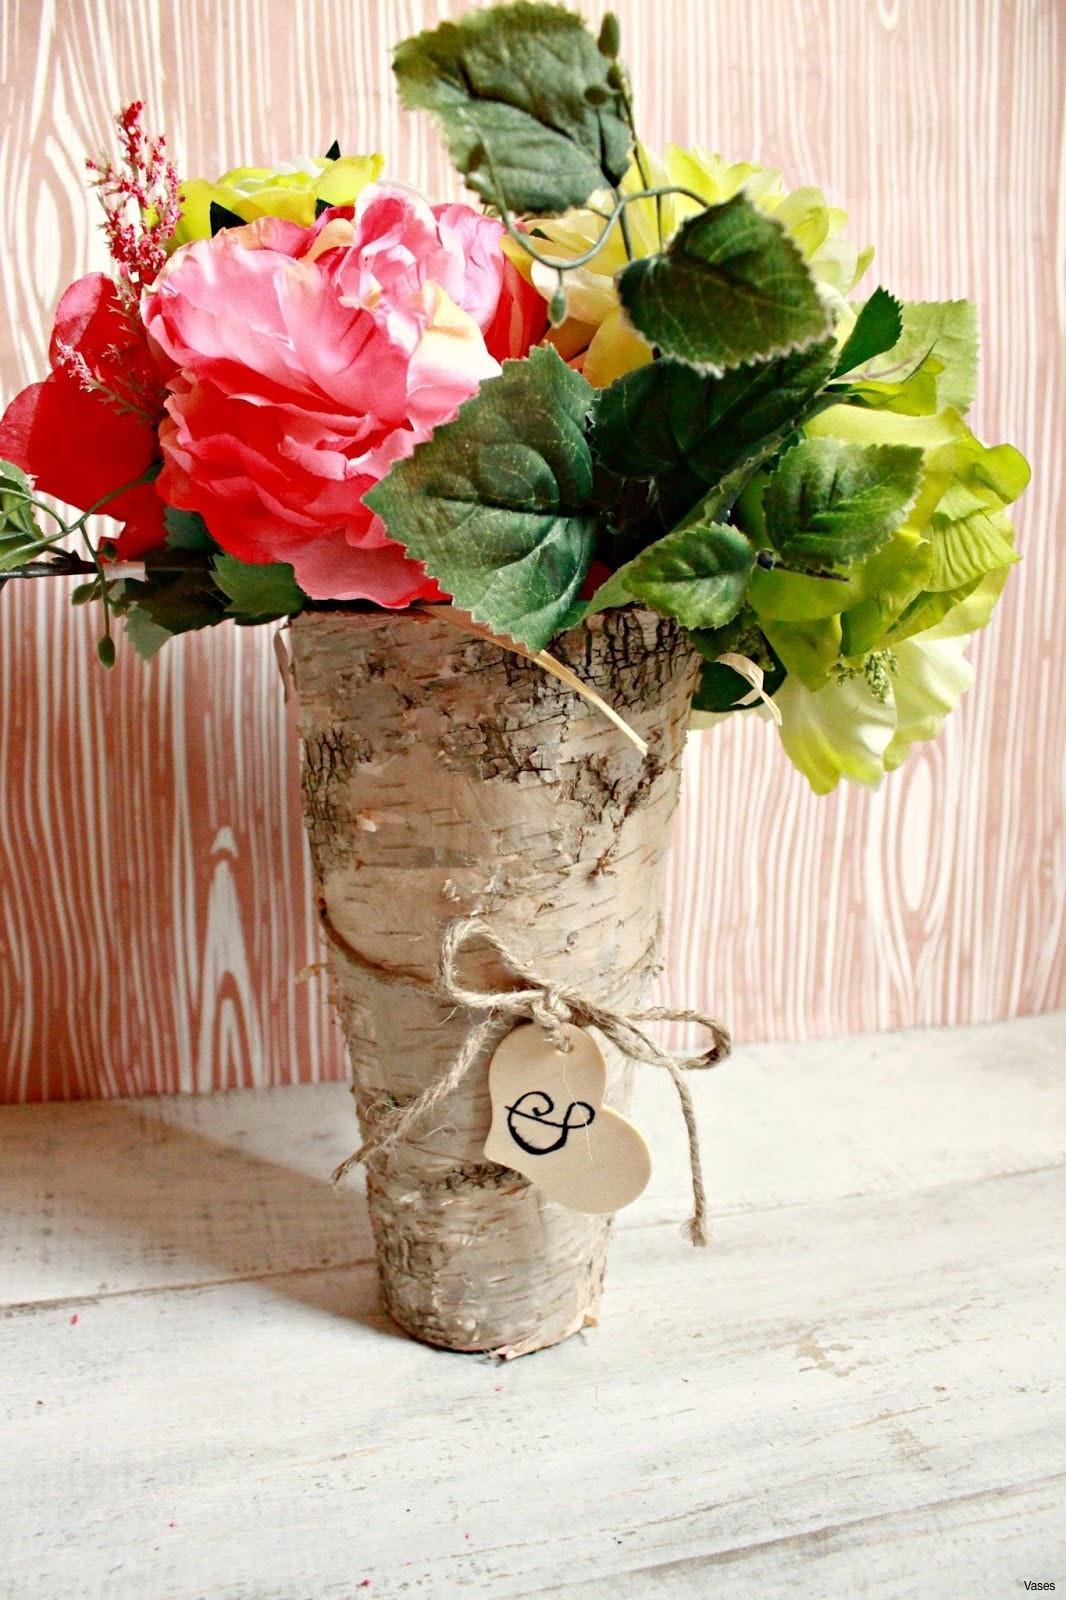 glass bud vase tubes of mini glass vase pics 8 tubes mini vase emerald chive cad eauonlineh pertaining to mini glass vase image elegant flower arrangements diy h vases diy wood vase i 0d base